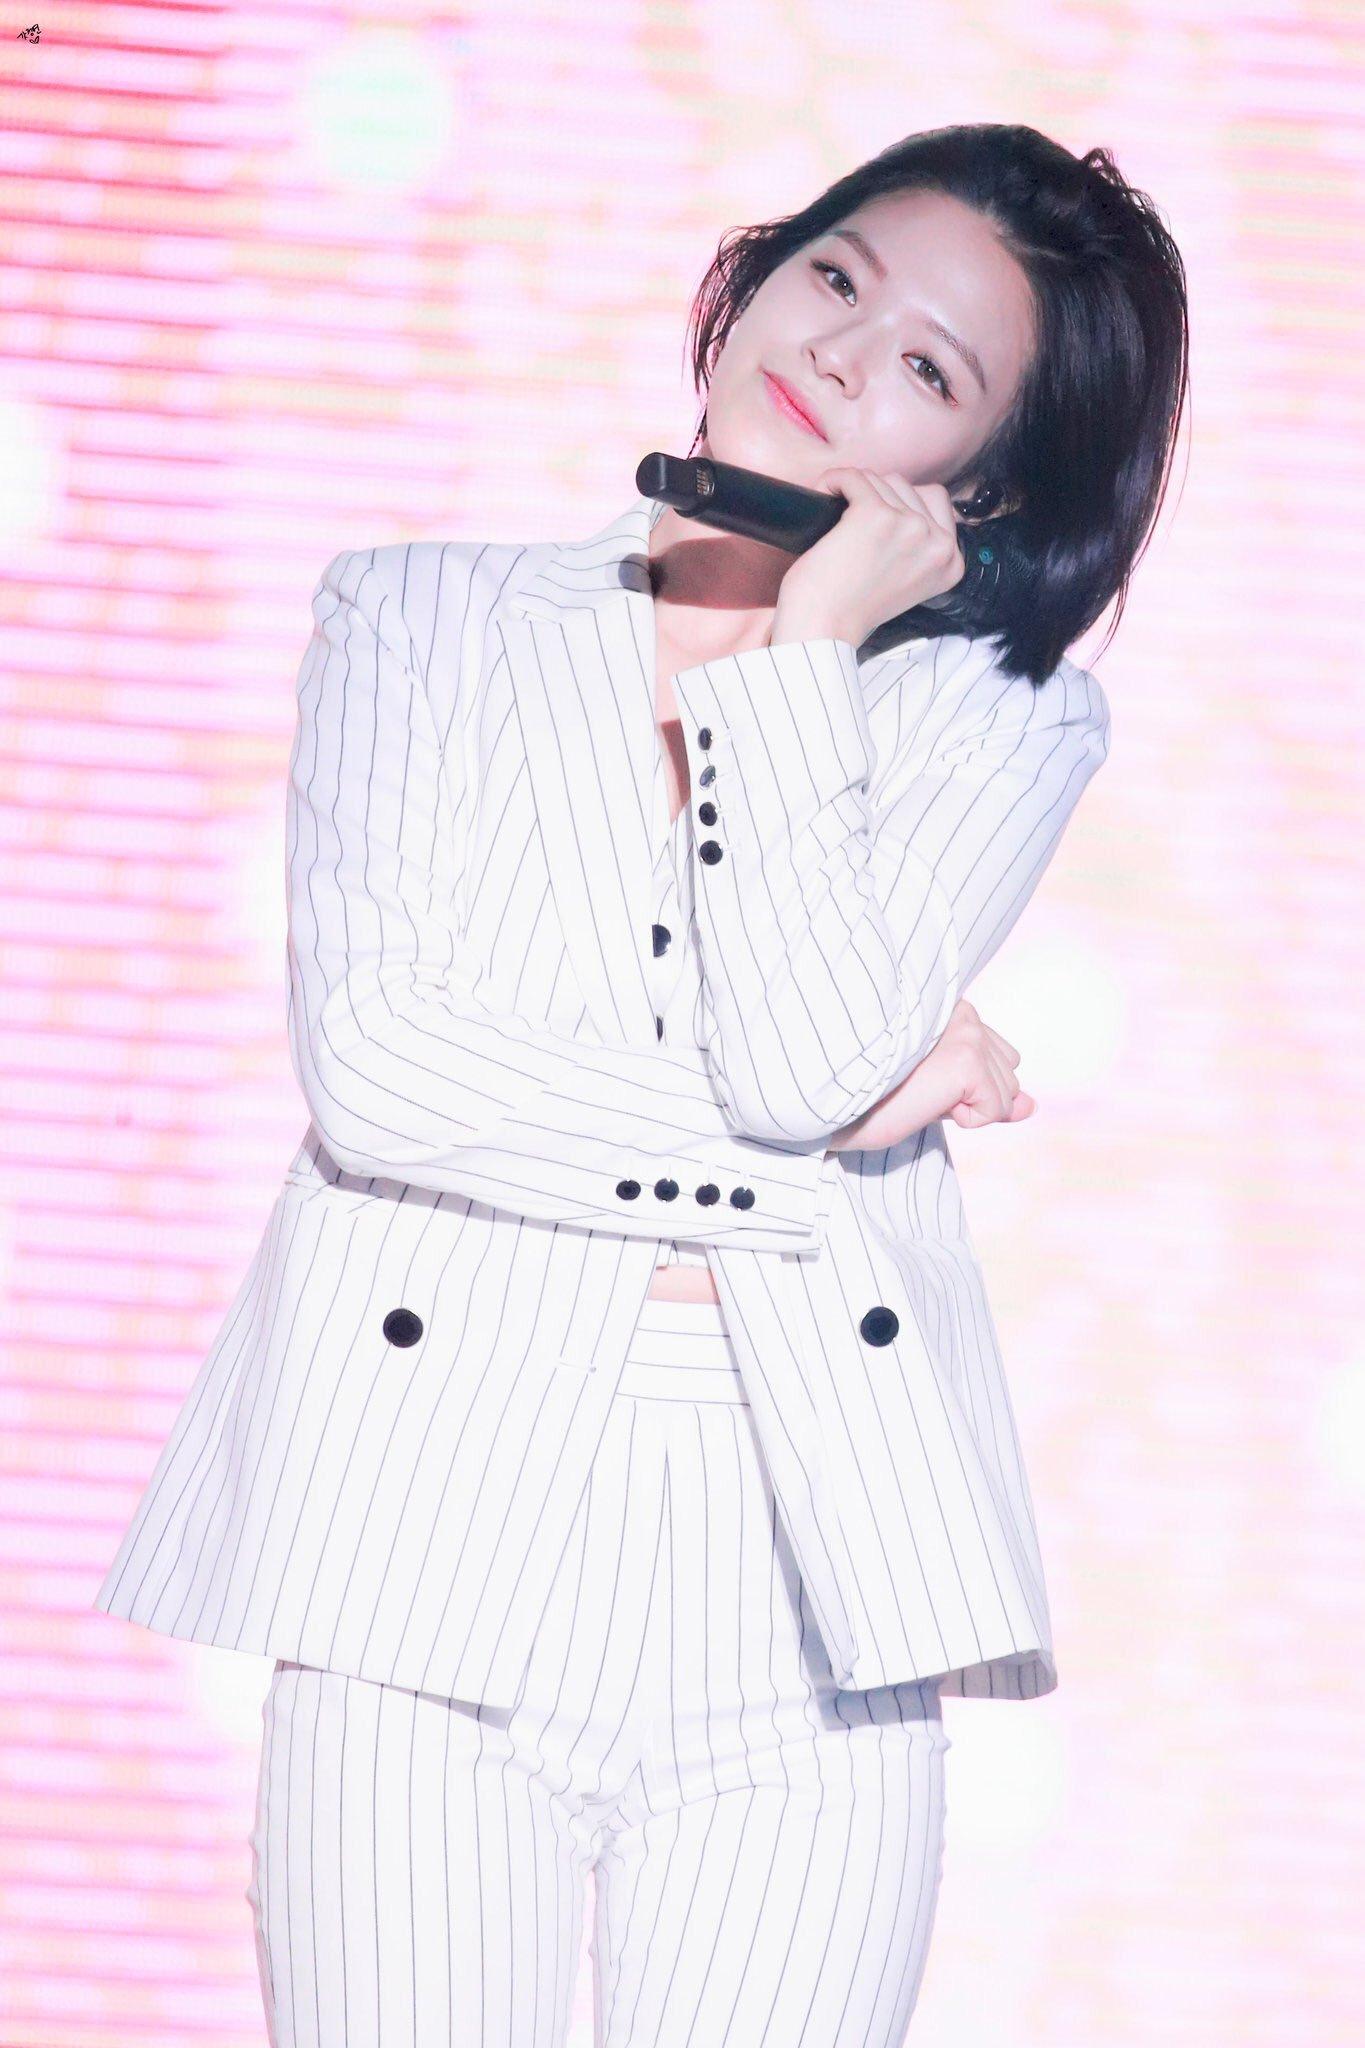 jeongyeon_lotte family concert_7